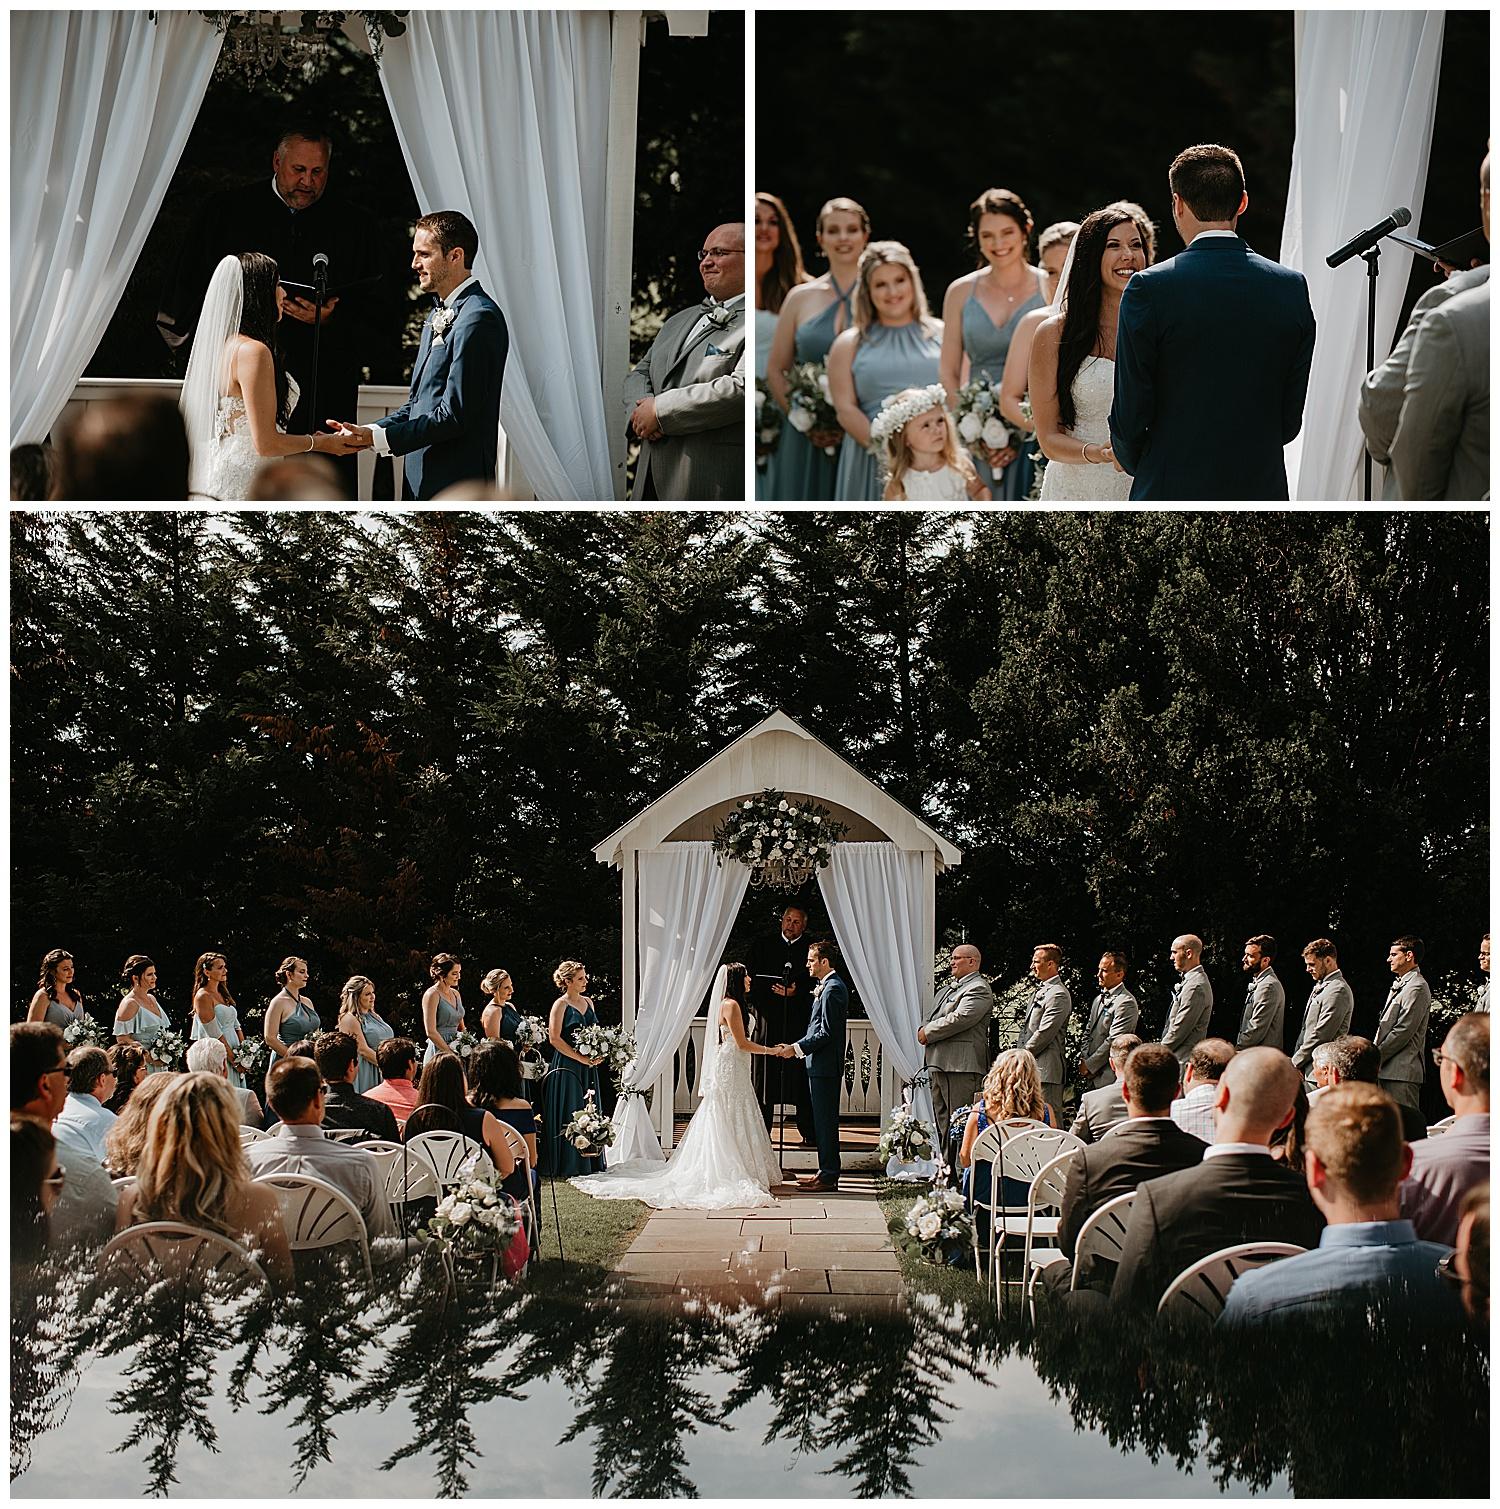 NEPA-Bloomsburg-Wedding-Photographer-at-The-Barn-at-Boones-Dam-Bloomsburg-PA_0034.jpg